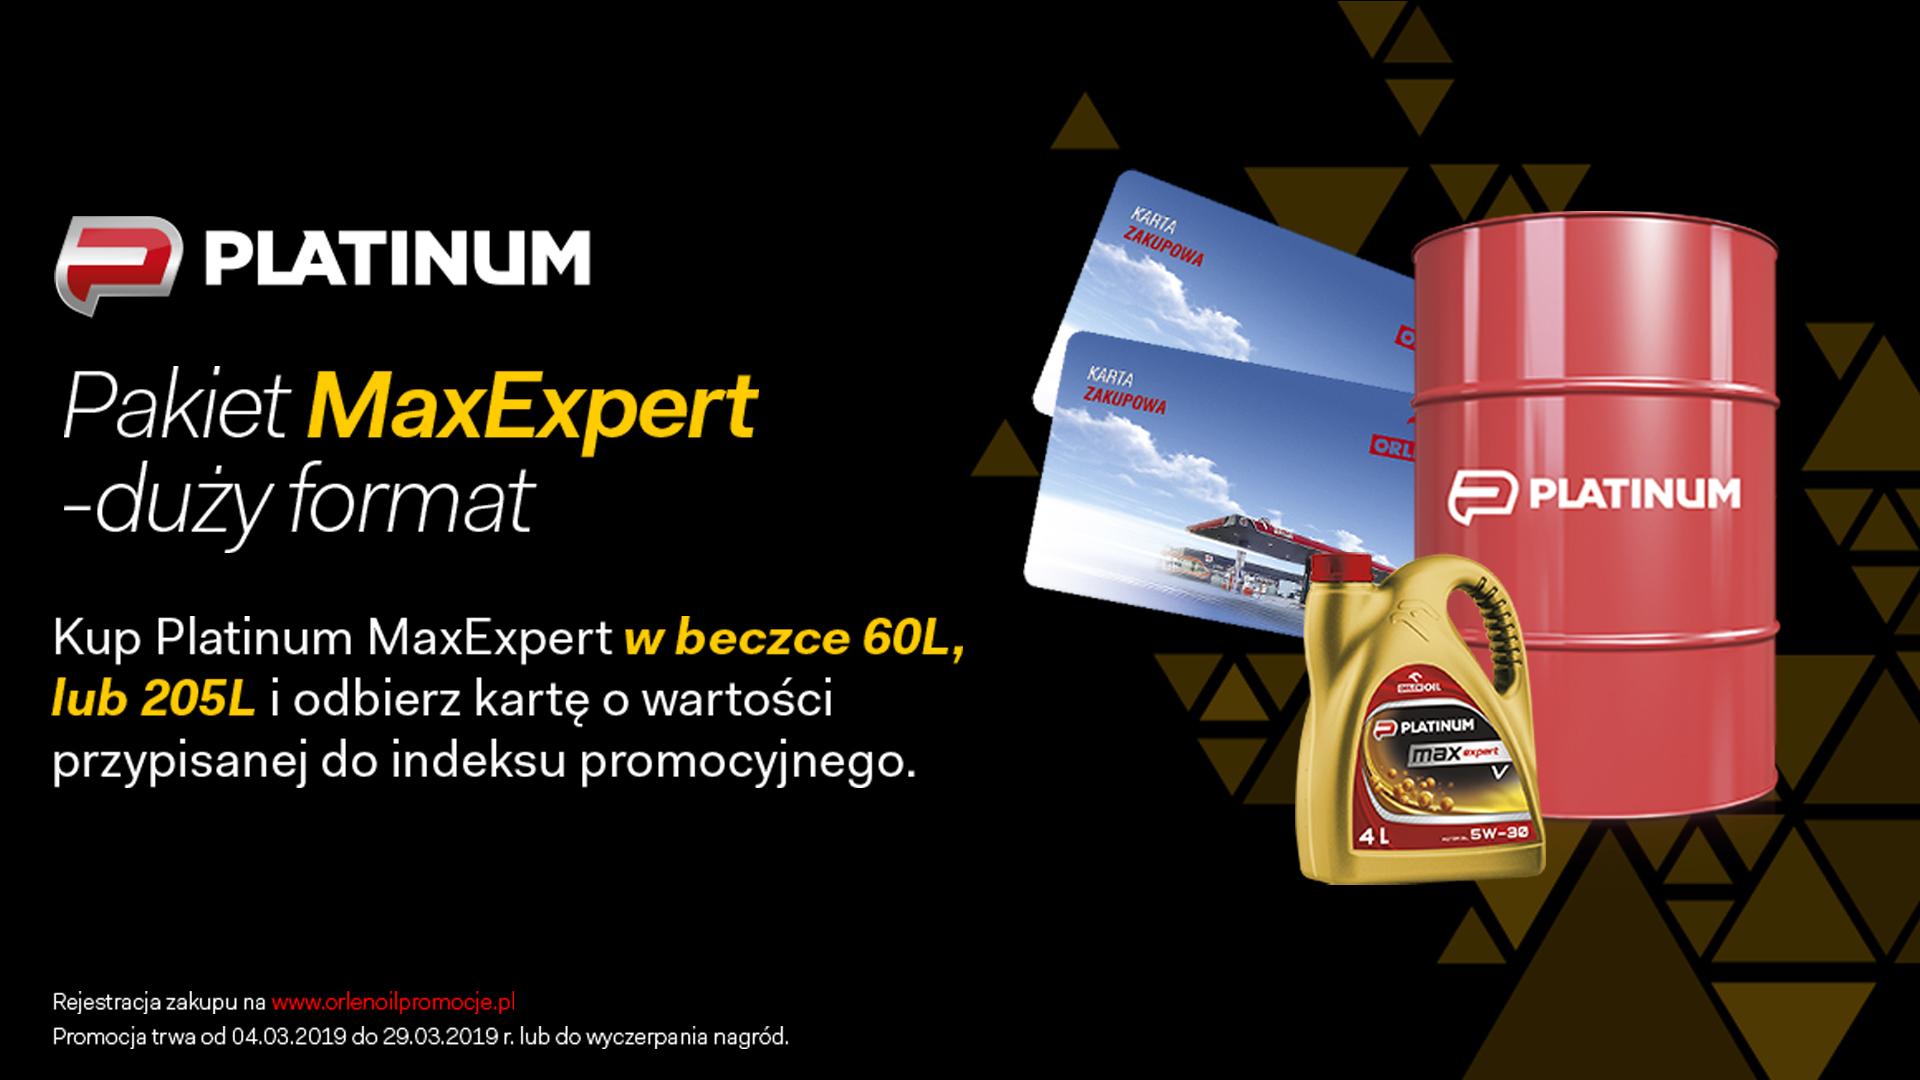 Promocja_PLATINUM_pakiet_MaxExpert_rynek_osobowy_1920x1080_newsletter.jpg